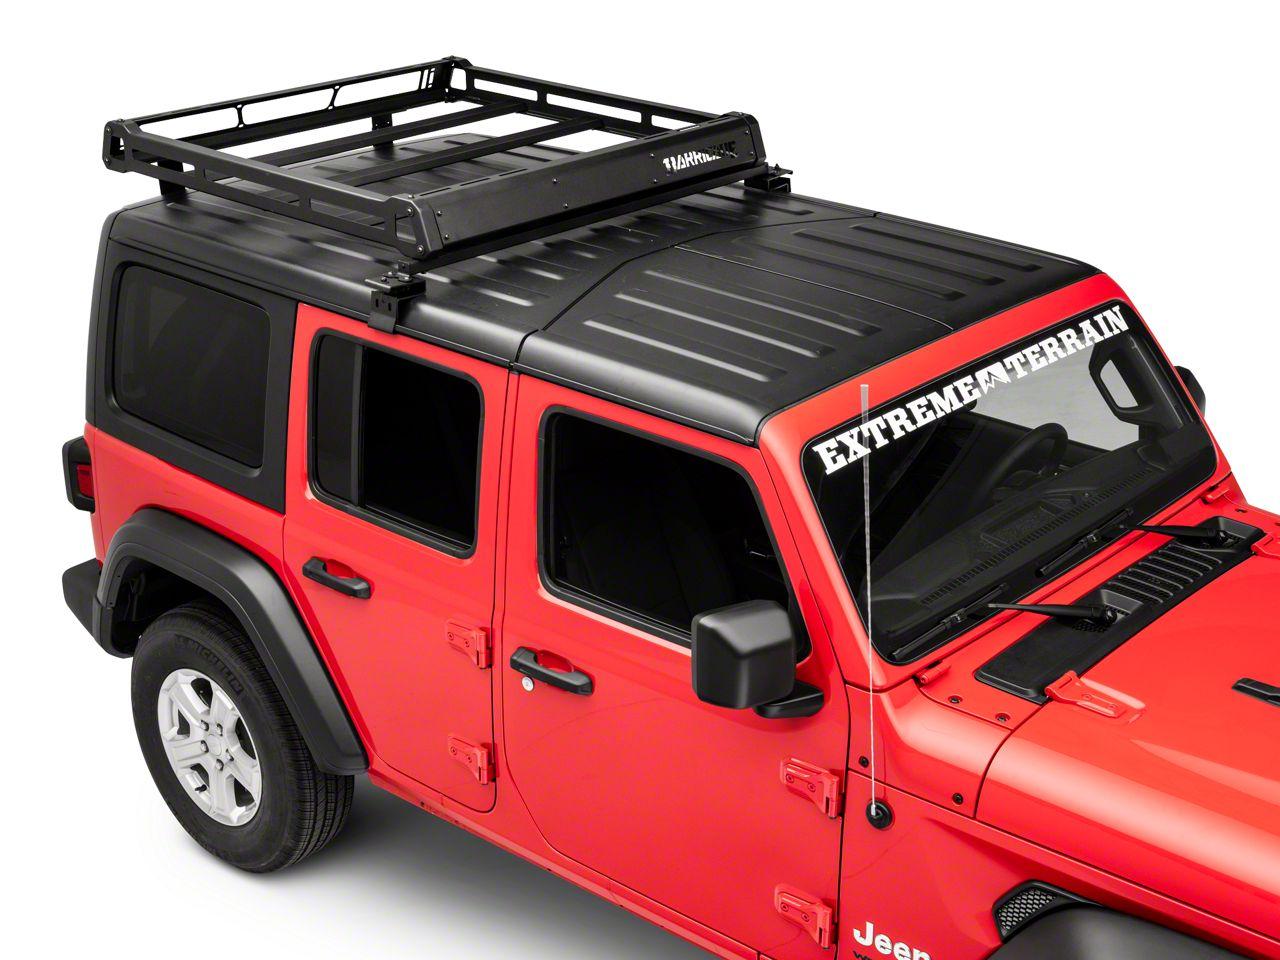 Barricade Jeep Wrangler Removable Hard Top Roof Basket For Oem Hard Top J123325 Jl 18 21 Jeep Wrangler Jl 4 Door